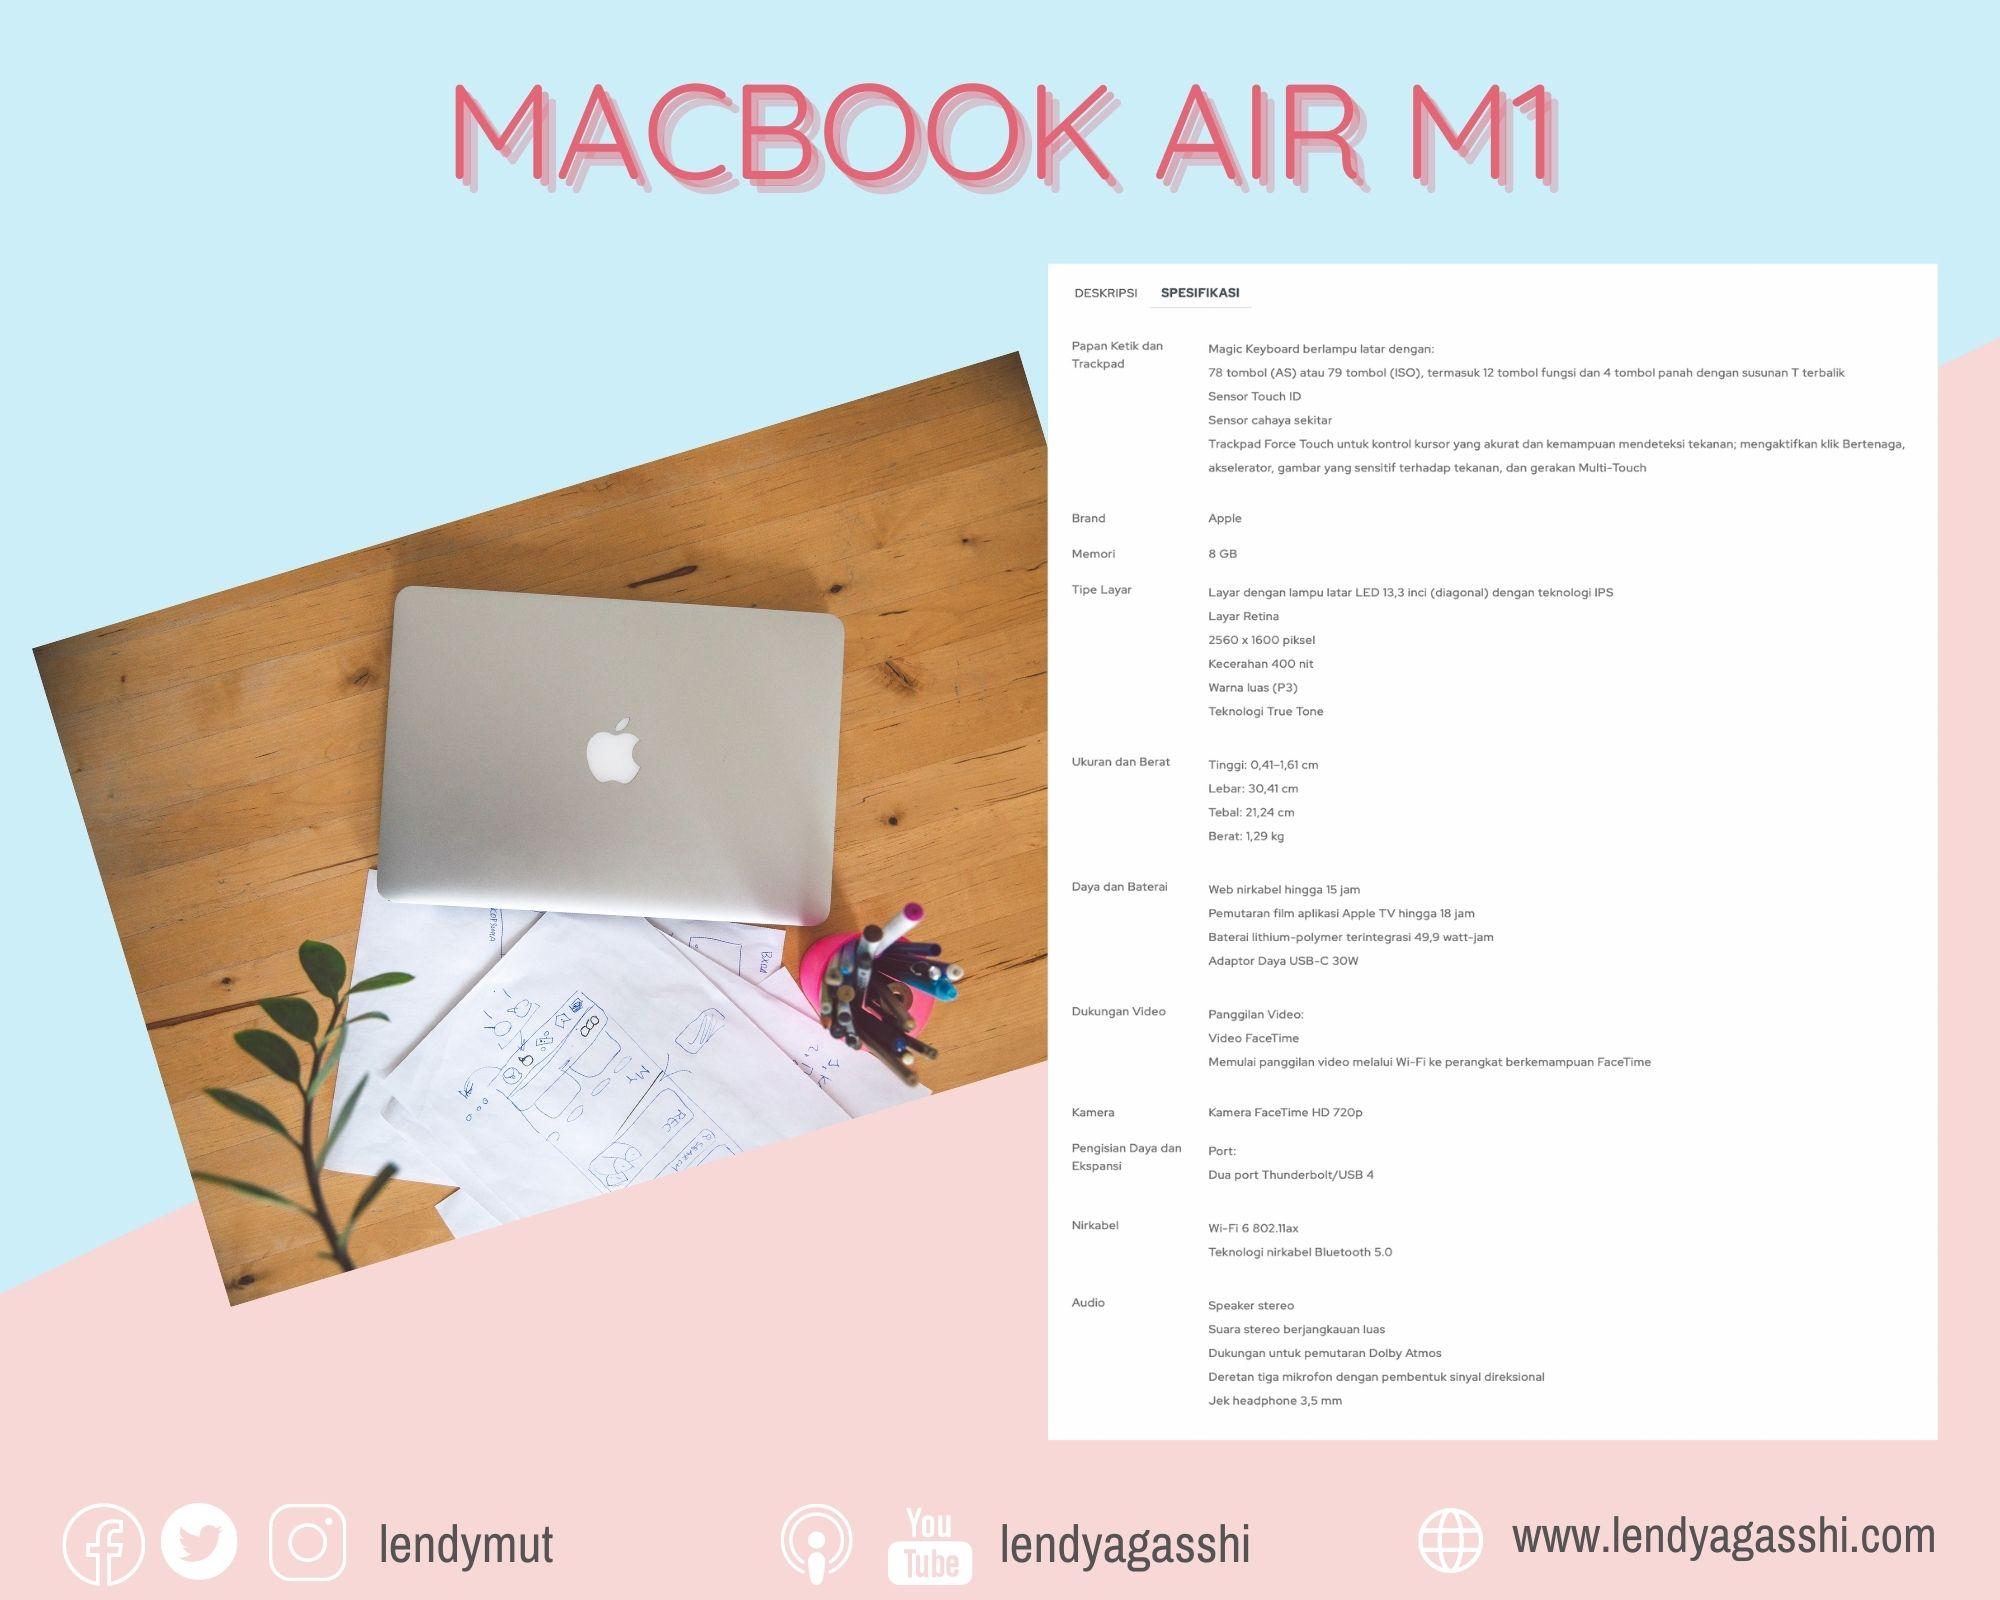 Spek MacBook Air M1